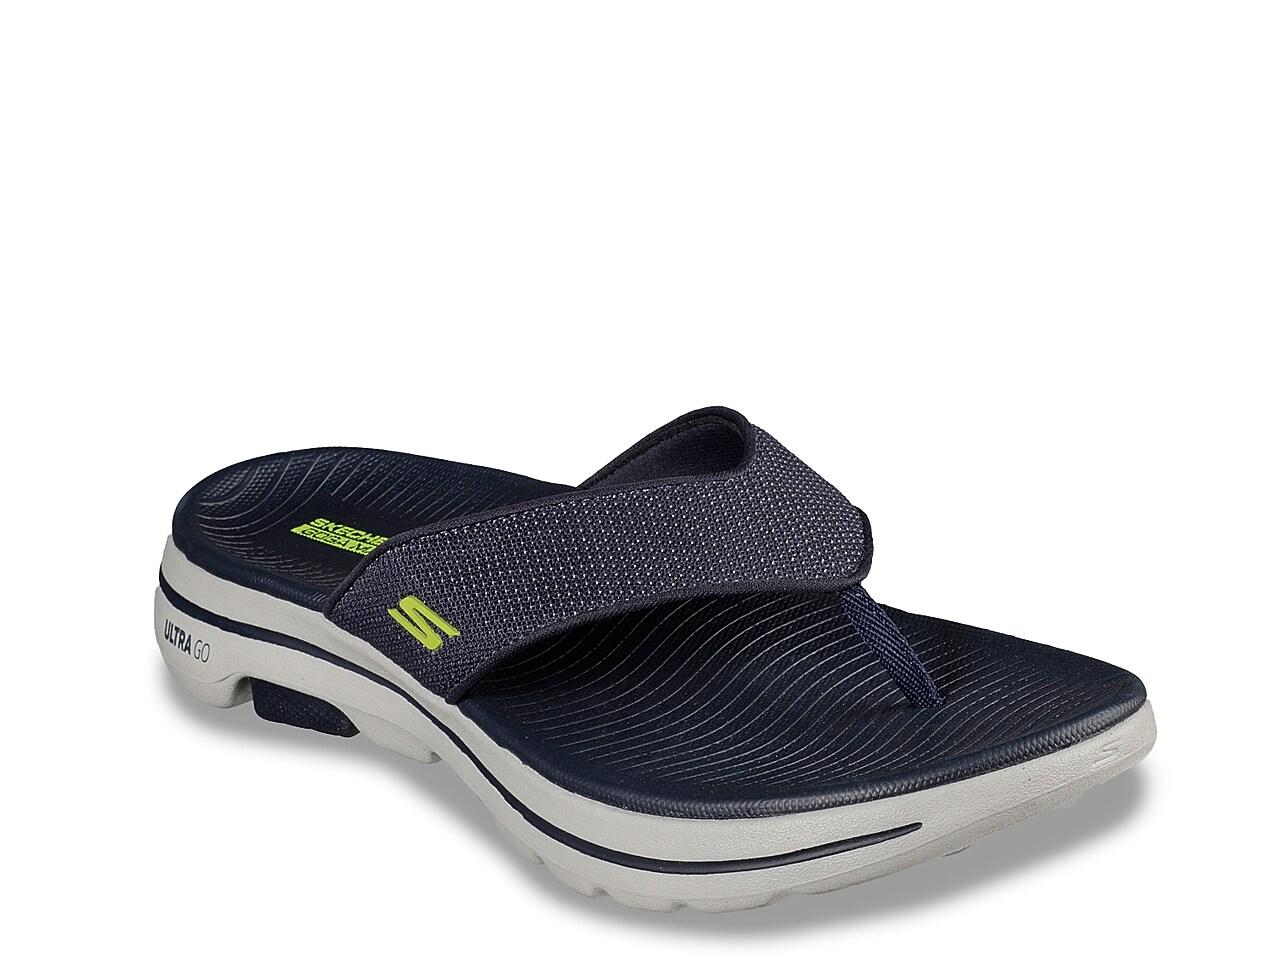 Skechers GOwalk 5 Iango Flip Flop